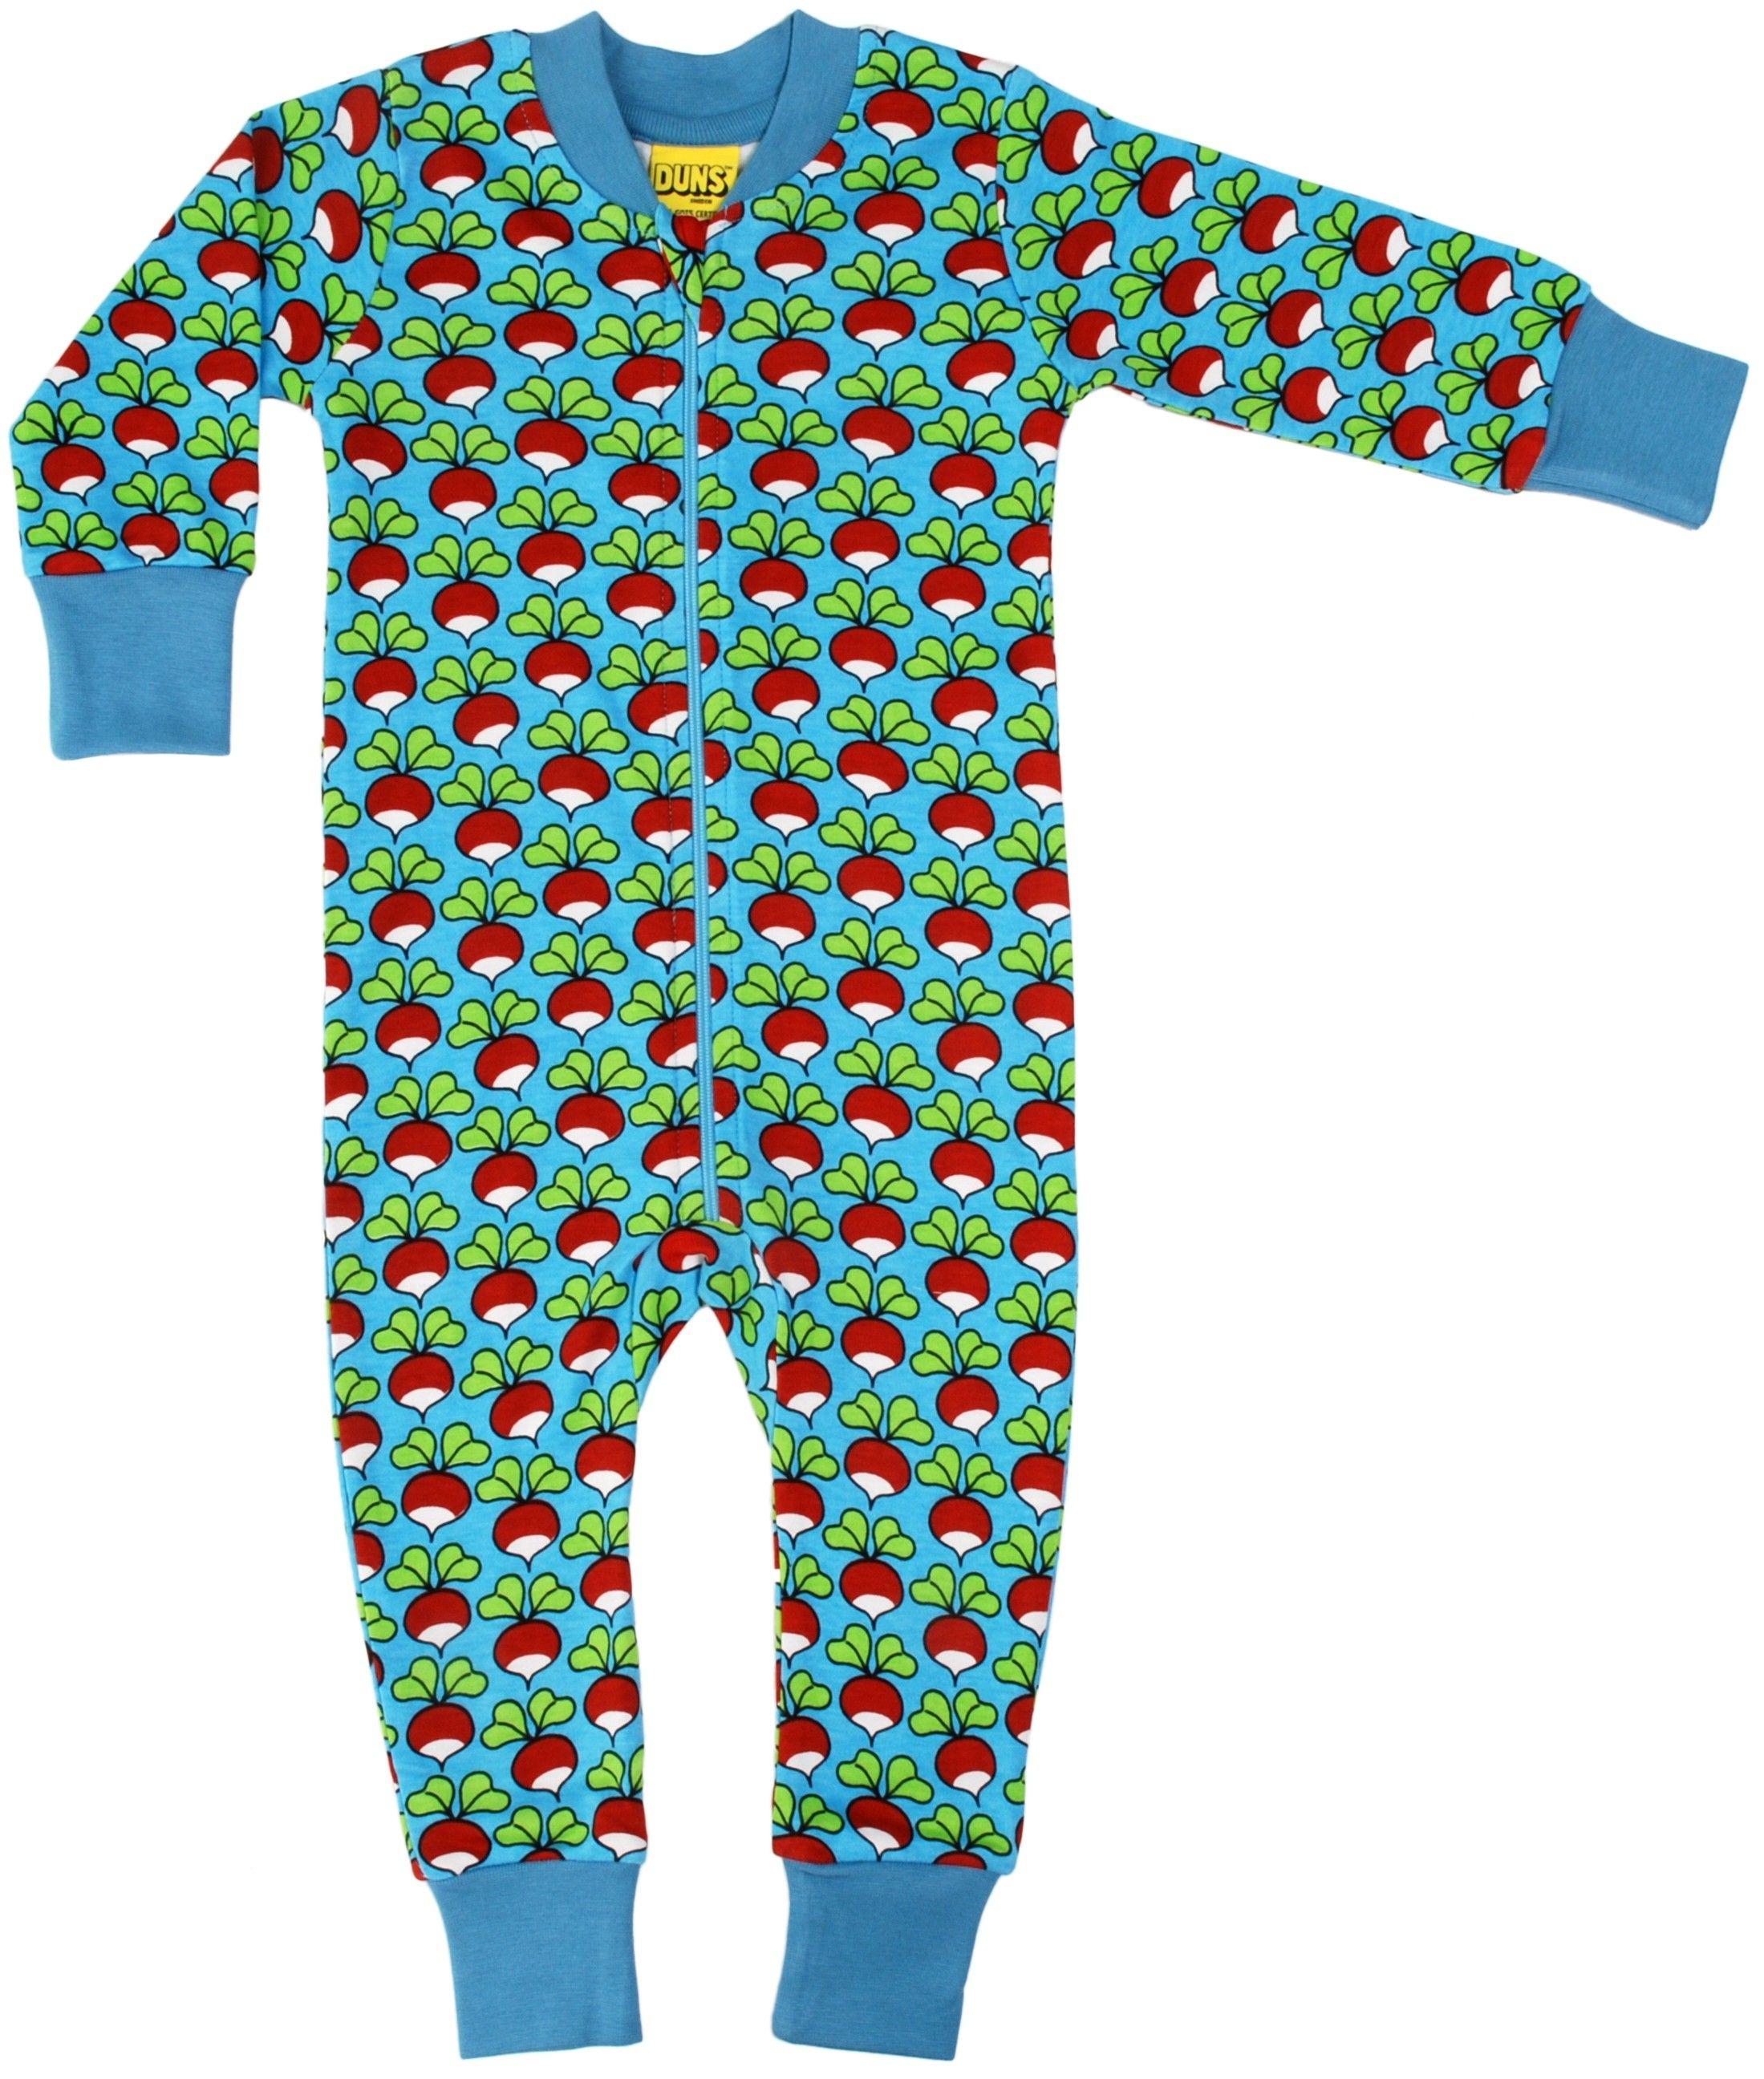 a36cdb258 DUNS Blue Radish Long Sleeve Zip Suit